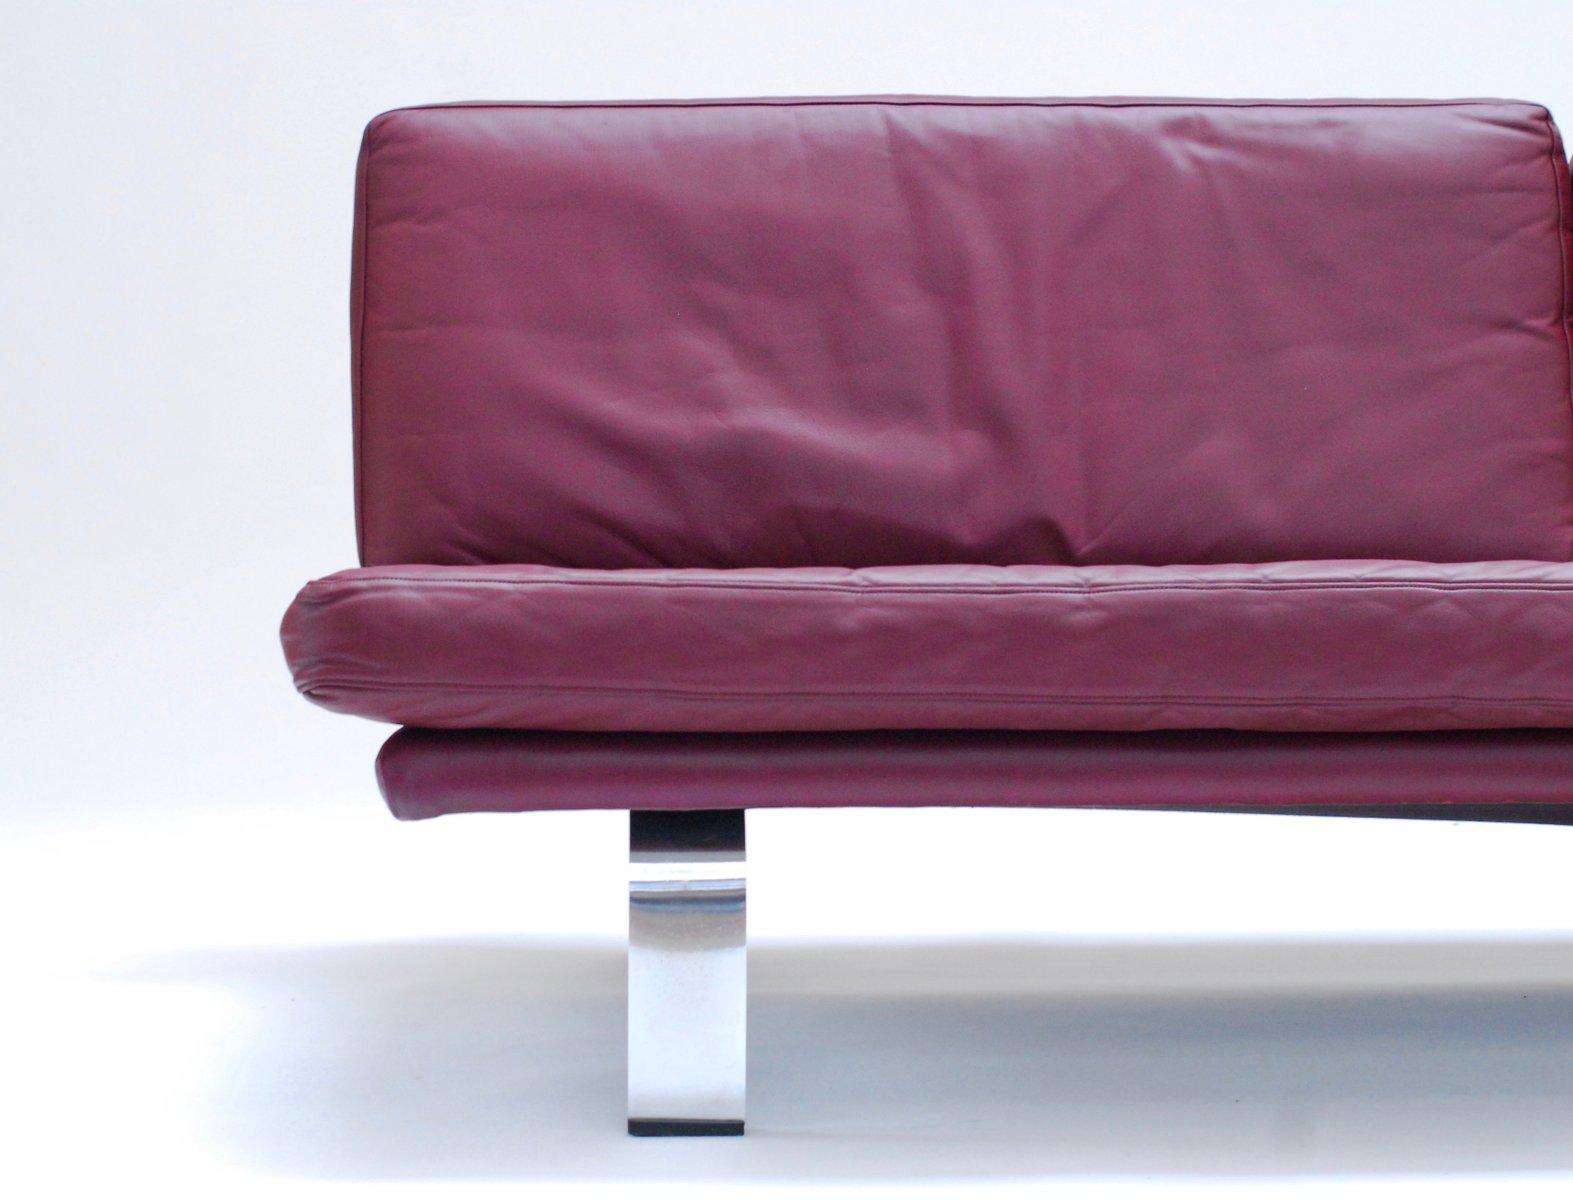 plum leather sofa small two seater  thesofa